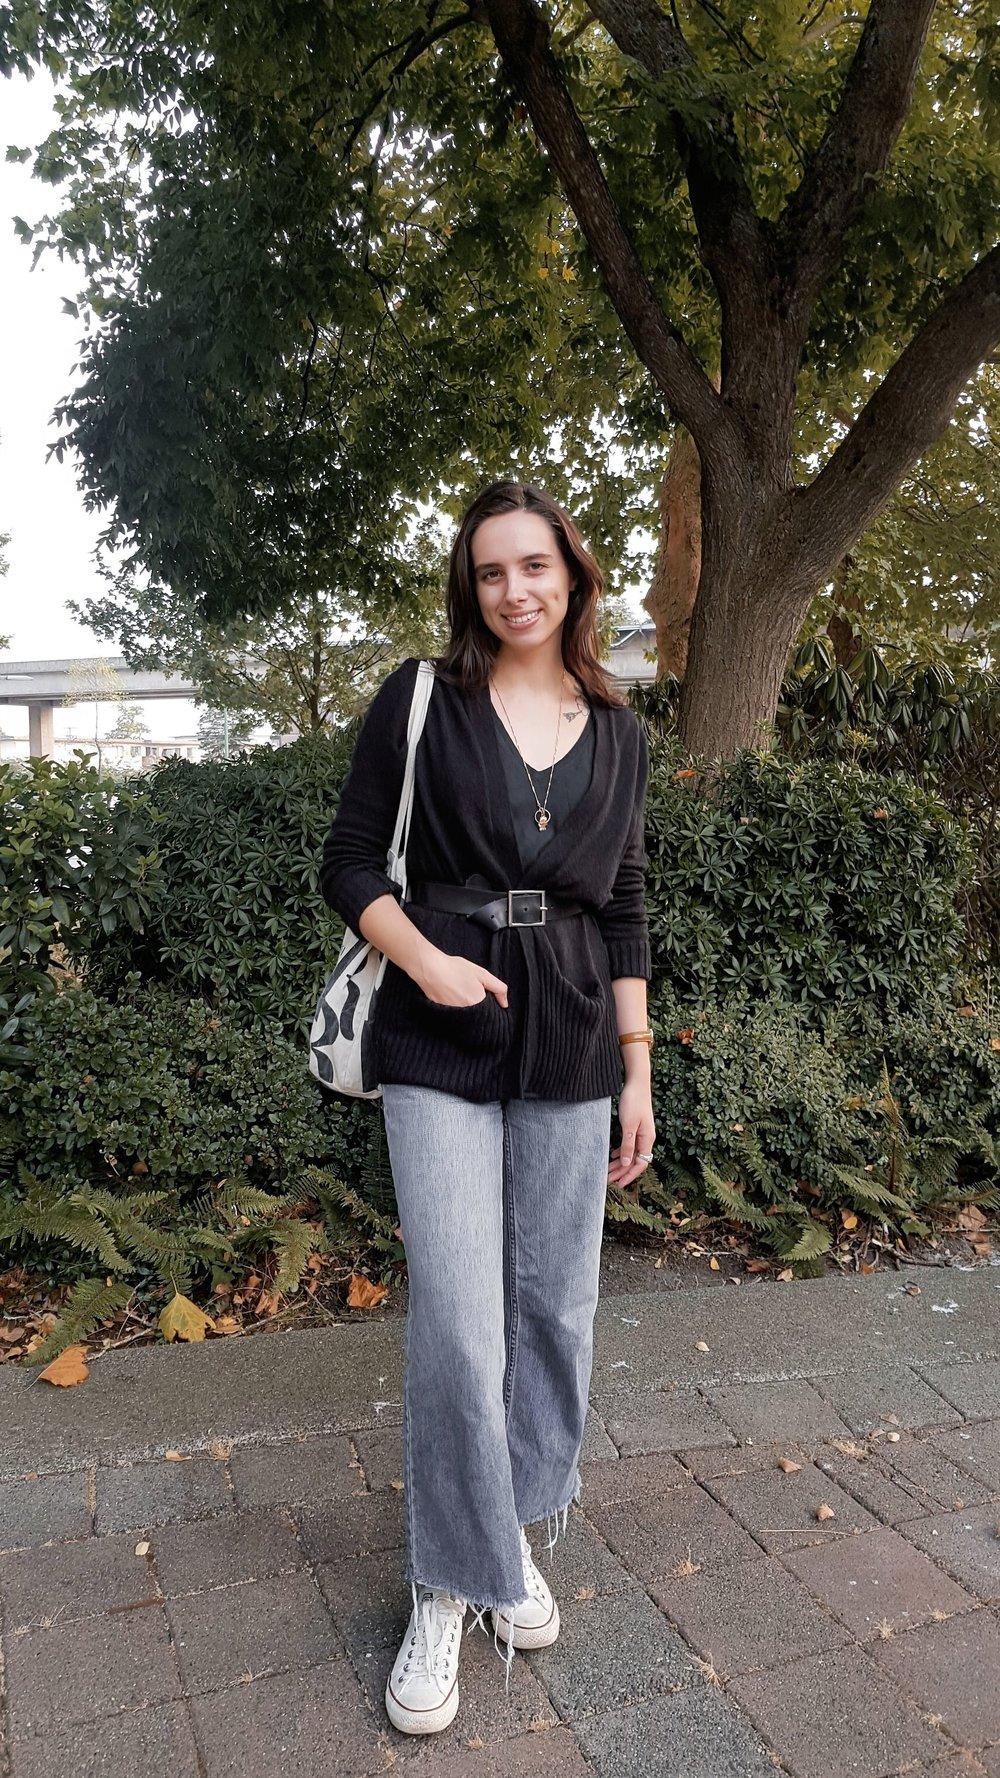 THURSDAY - Aritzia sweater, Zara tee, BDG jeans, Converse sneakers